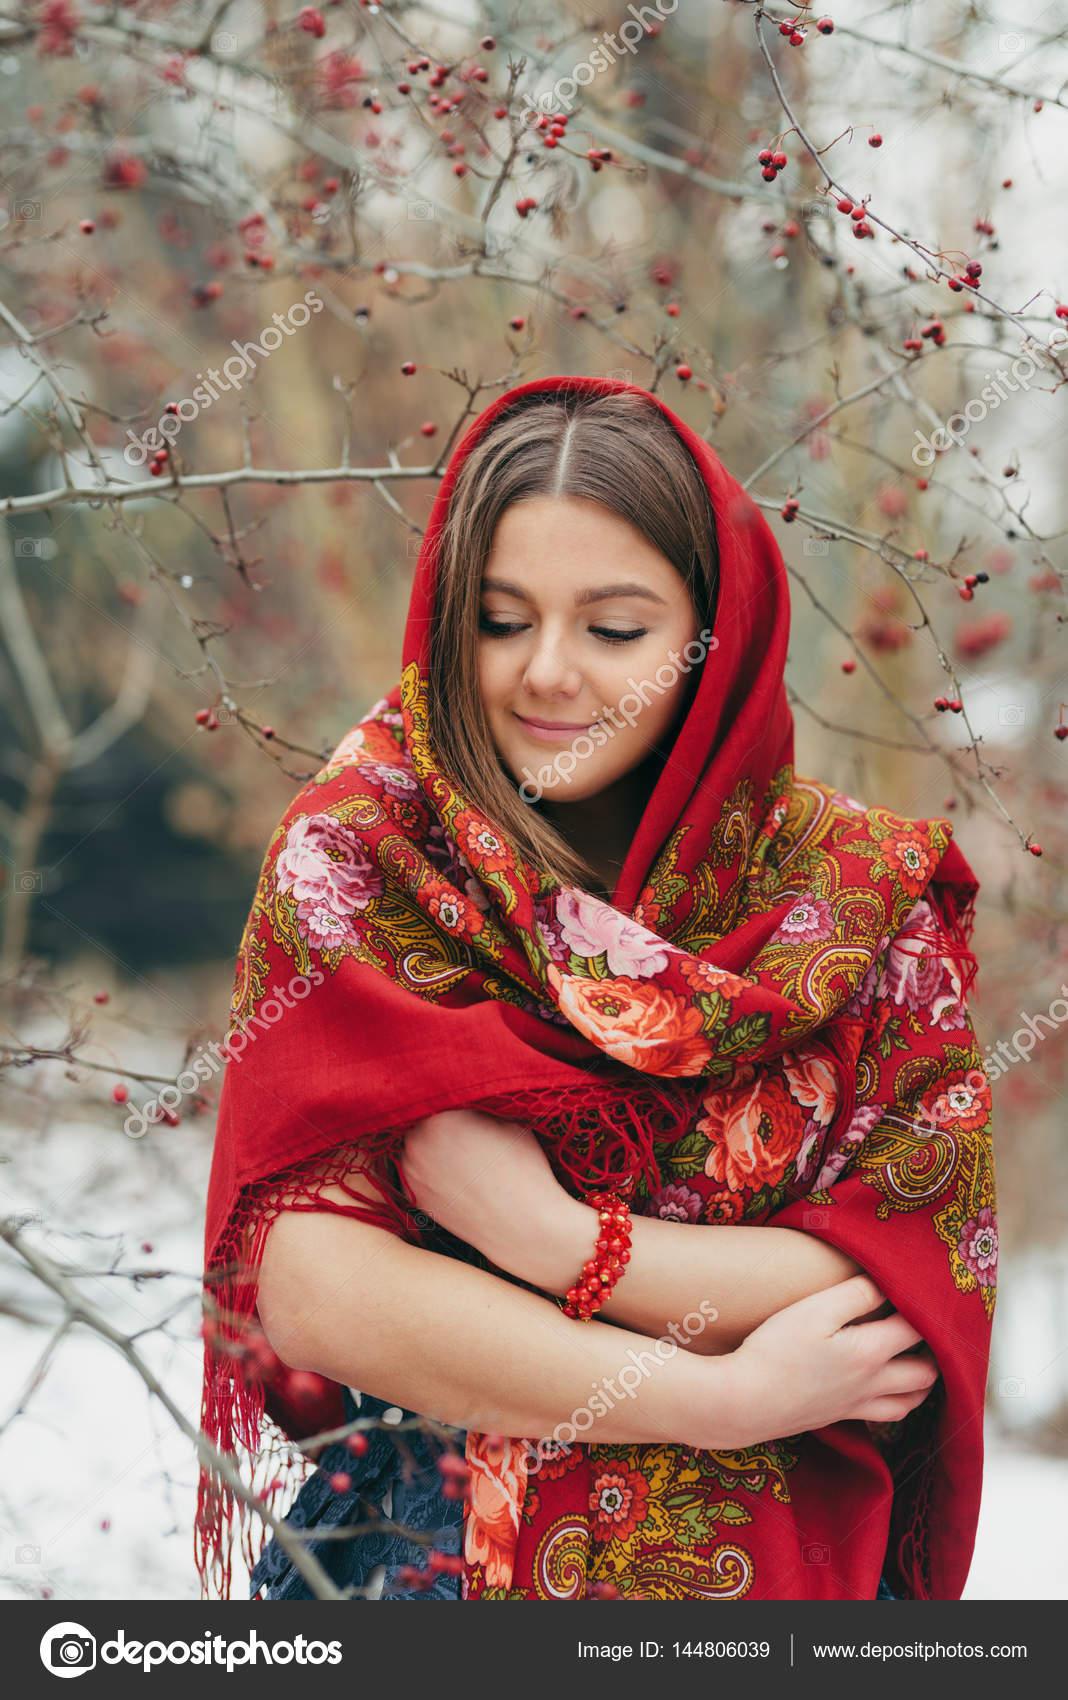 https://st3.depositphotos.com/3153157/14480/i/1600/depositphotos_144806039-stock-photo-beautiful-woman-in-russian-traditional.jpg